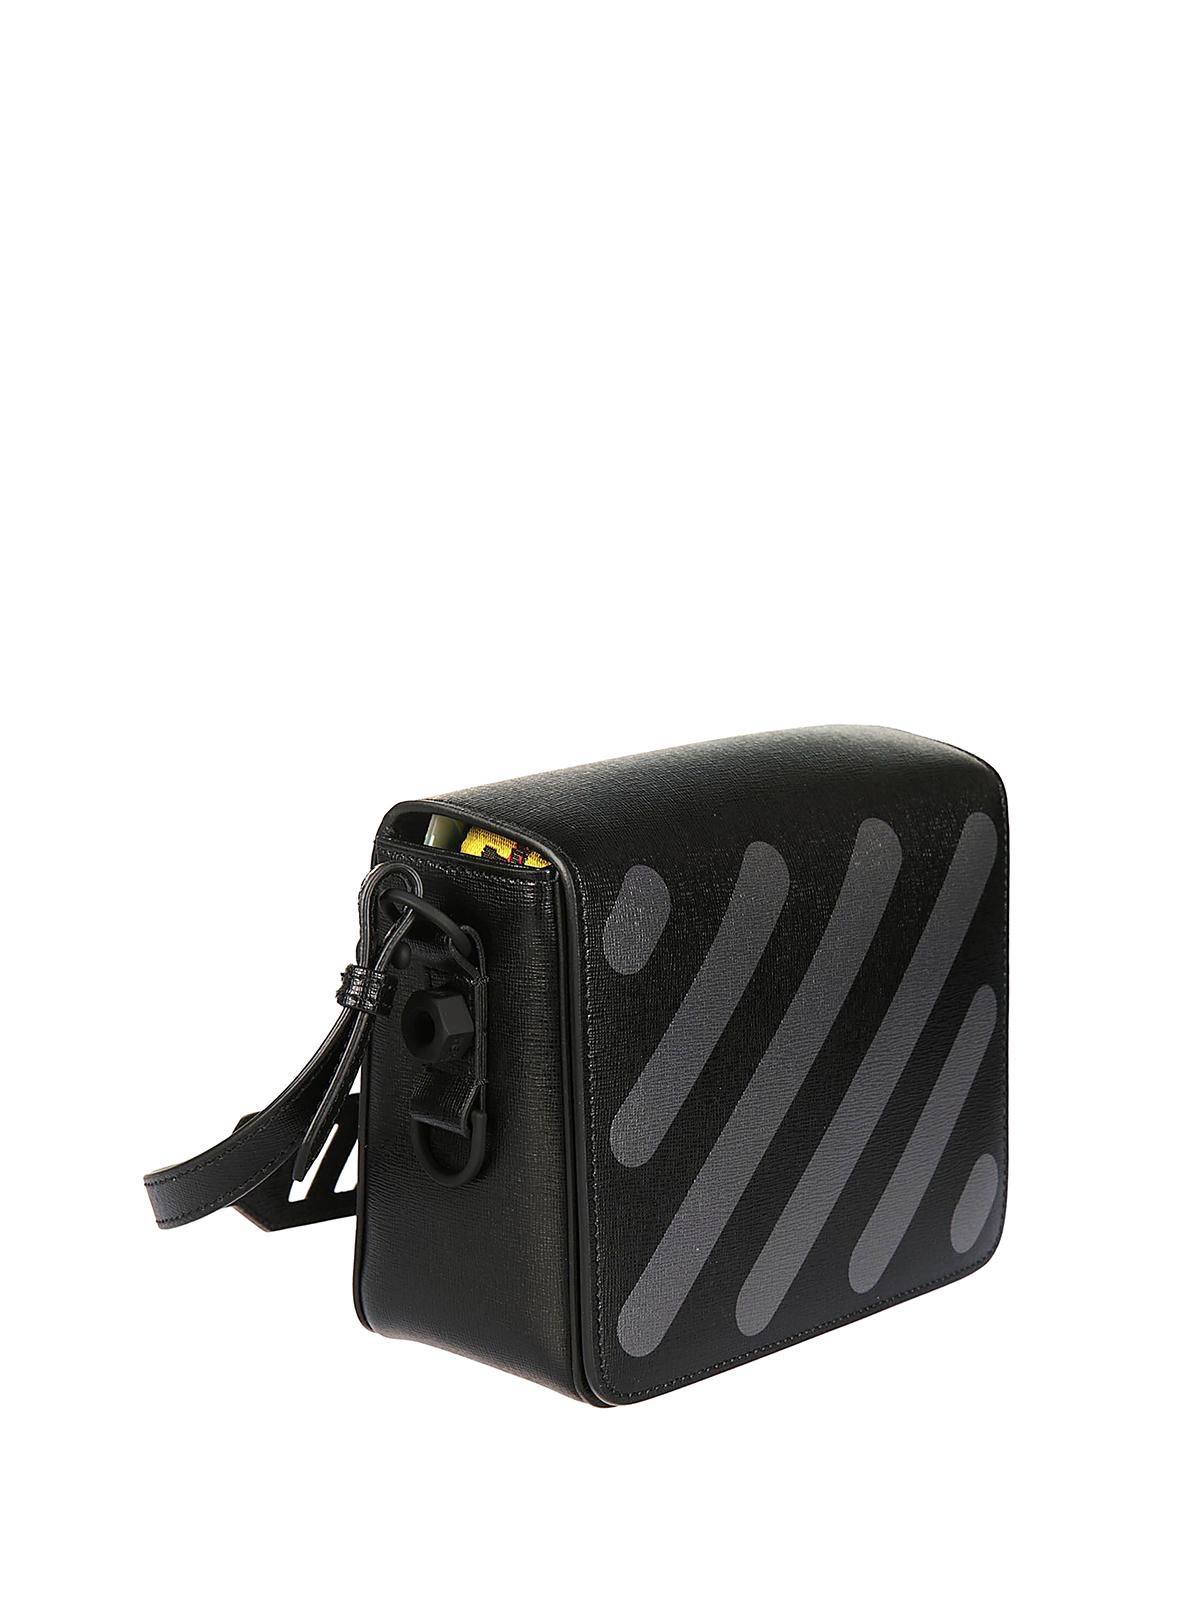 Off-white Virgil Abloh dark grey diag bag DMoy4lZ2Do